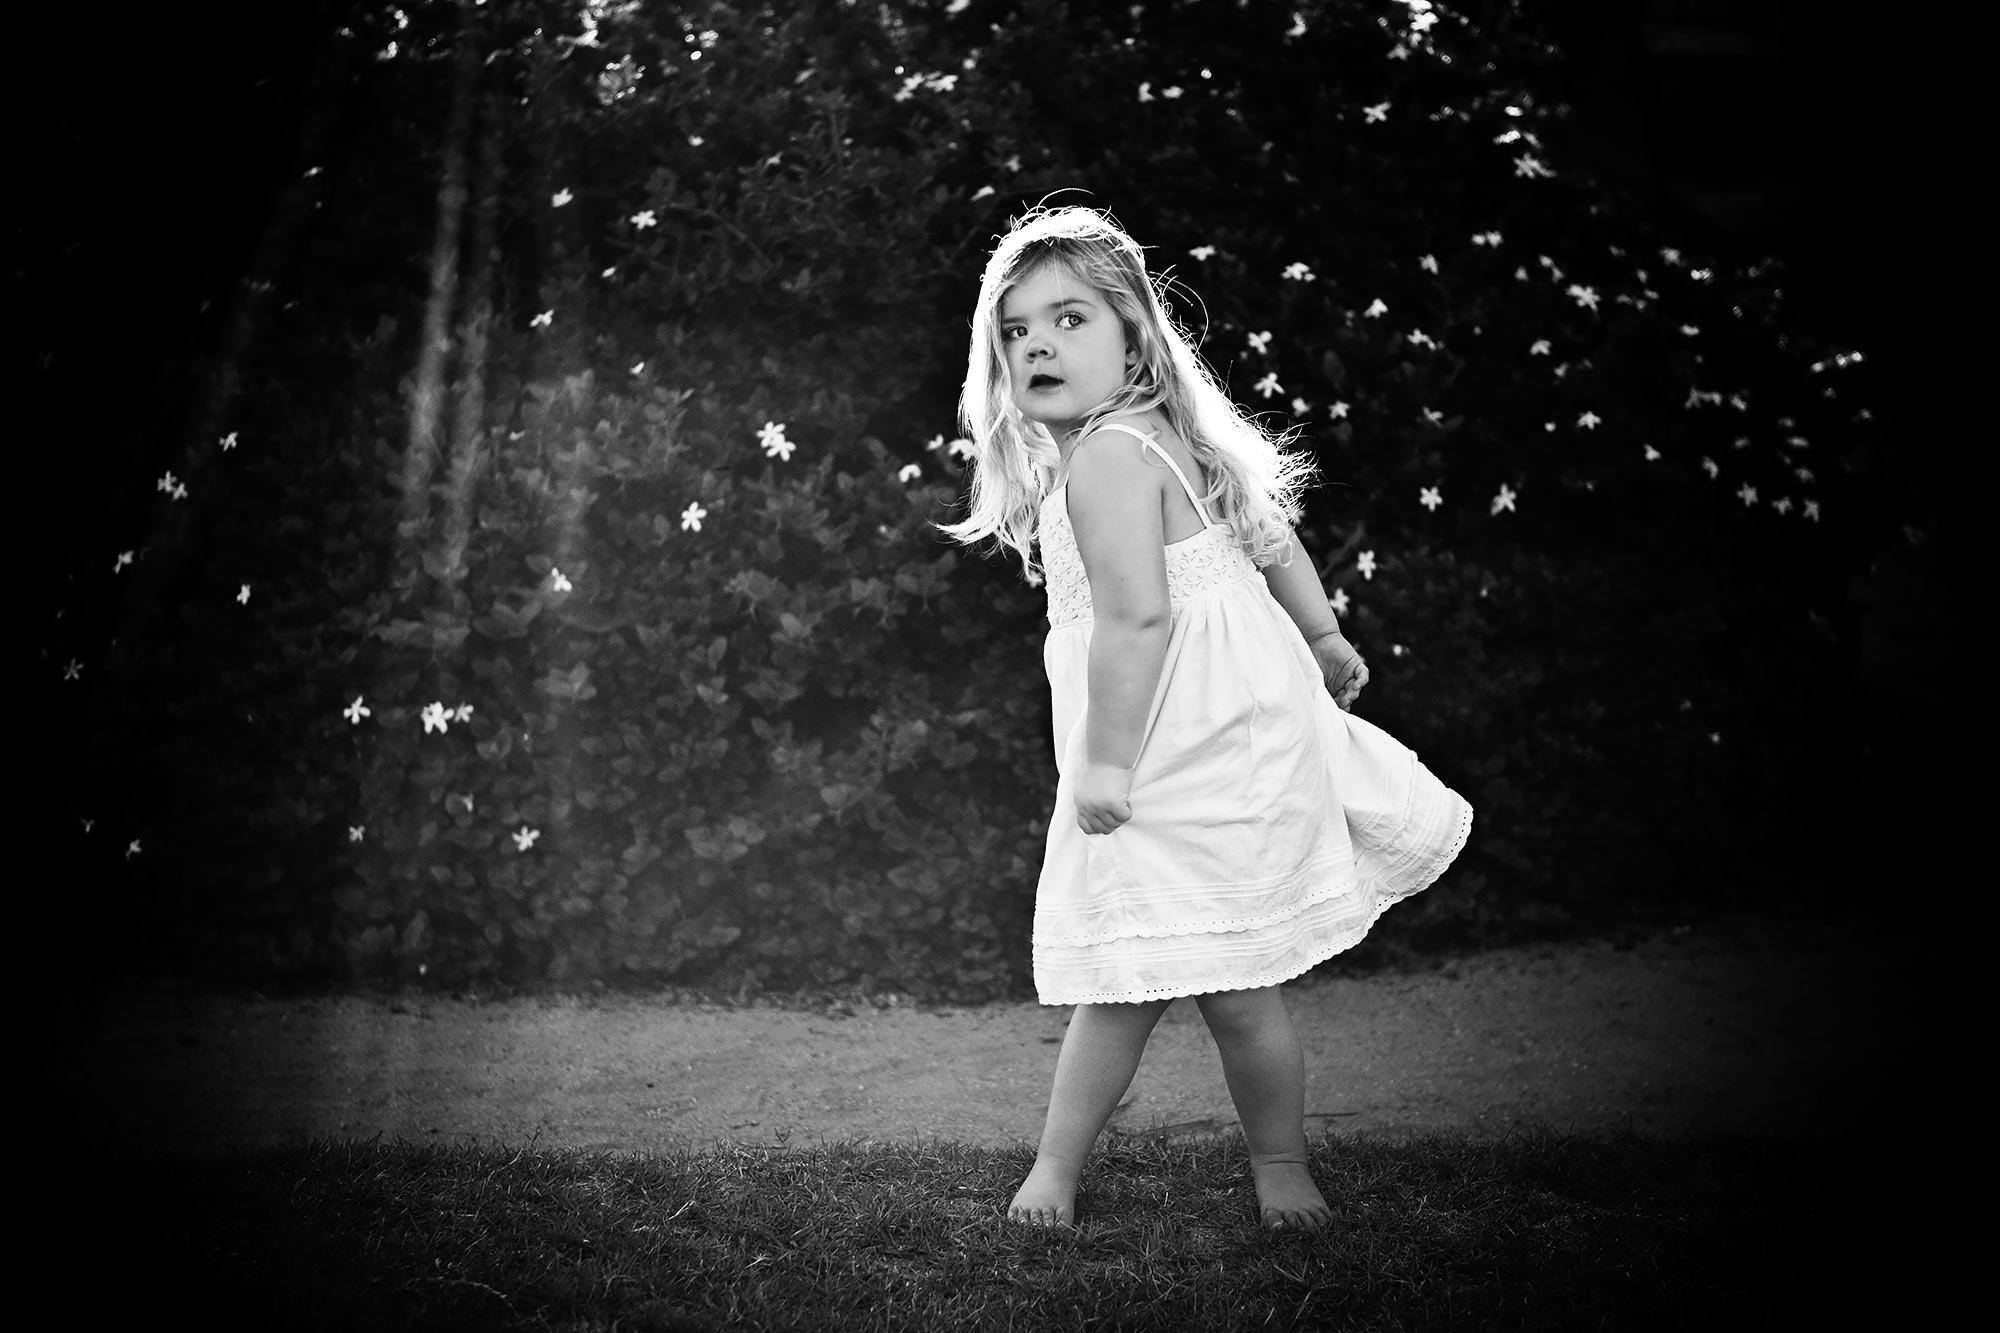 ipswich-bradley-palmer-family-portraits-stephen-grant-photography-013.jpg